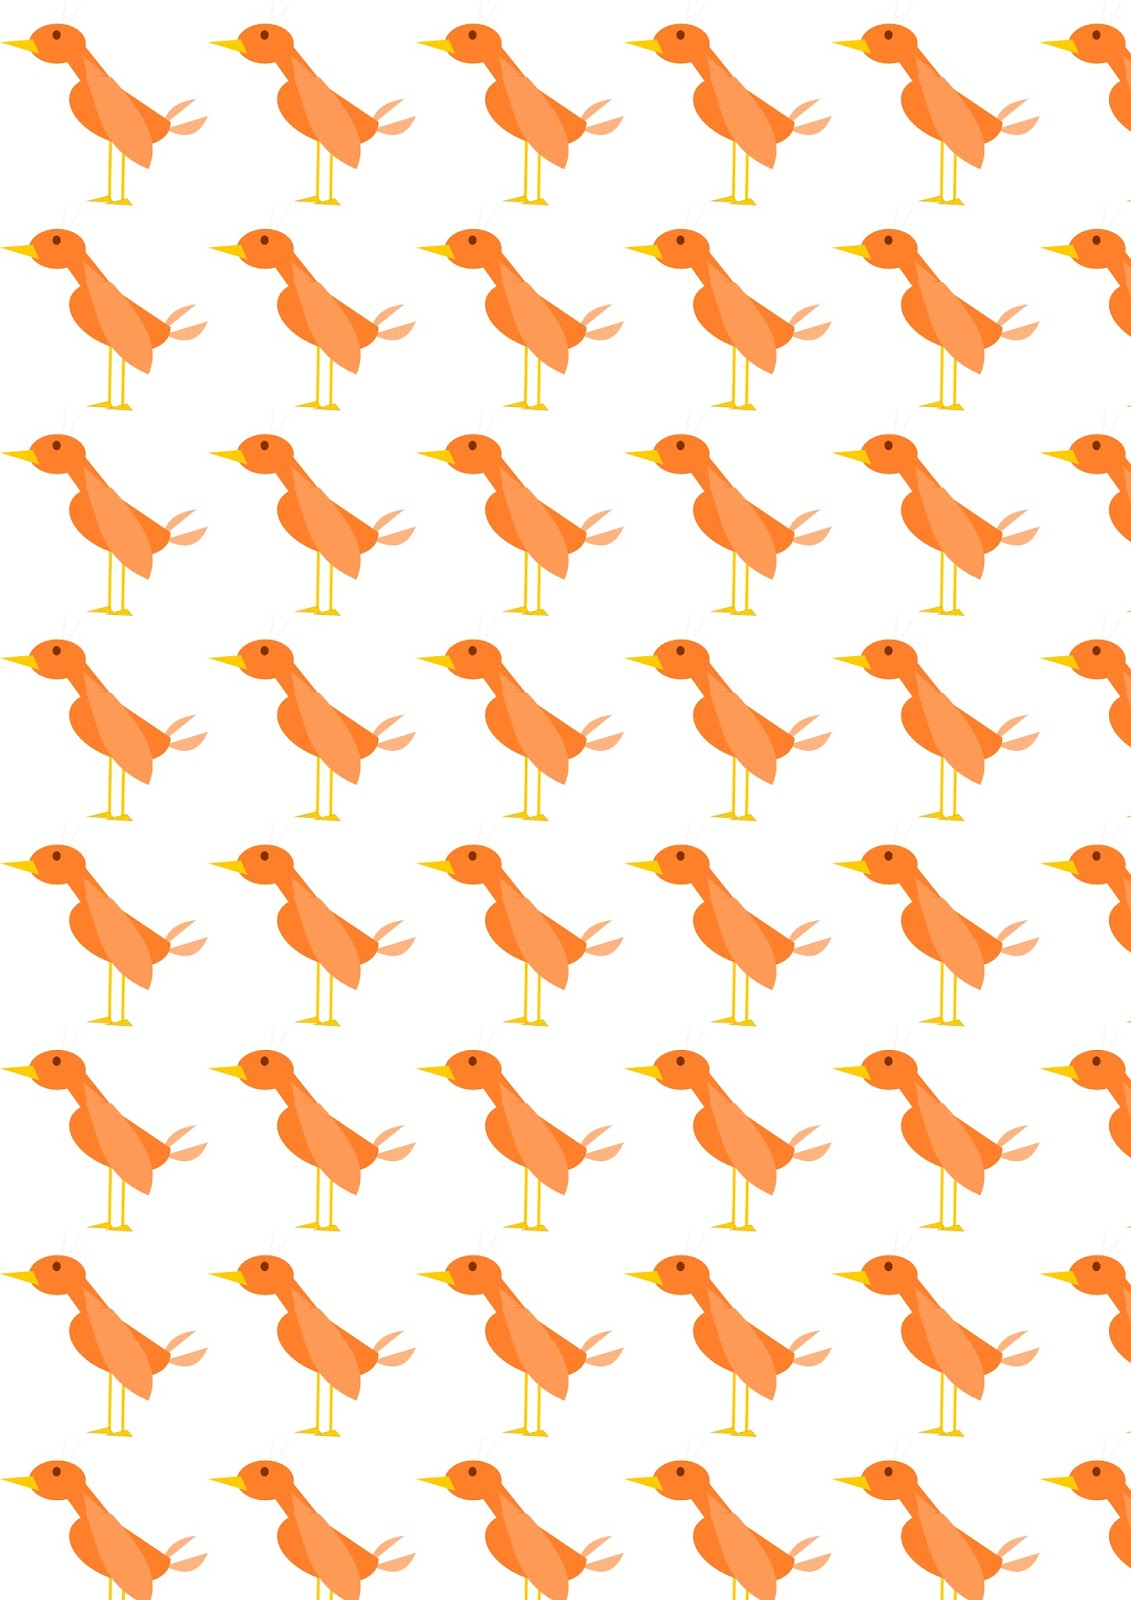 http://3.bp.blogspot.com/-G_X0e29mrS8/U2OYtOgDrdI/AAAAAAAAeKs/MNyMLYfIo1s/s1600/orange_duck_paper_A4.jpg